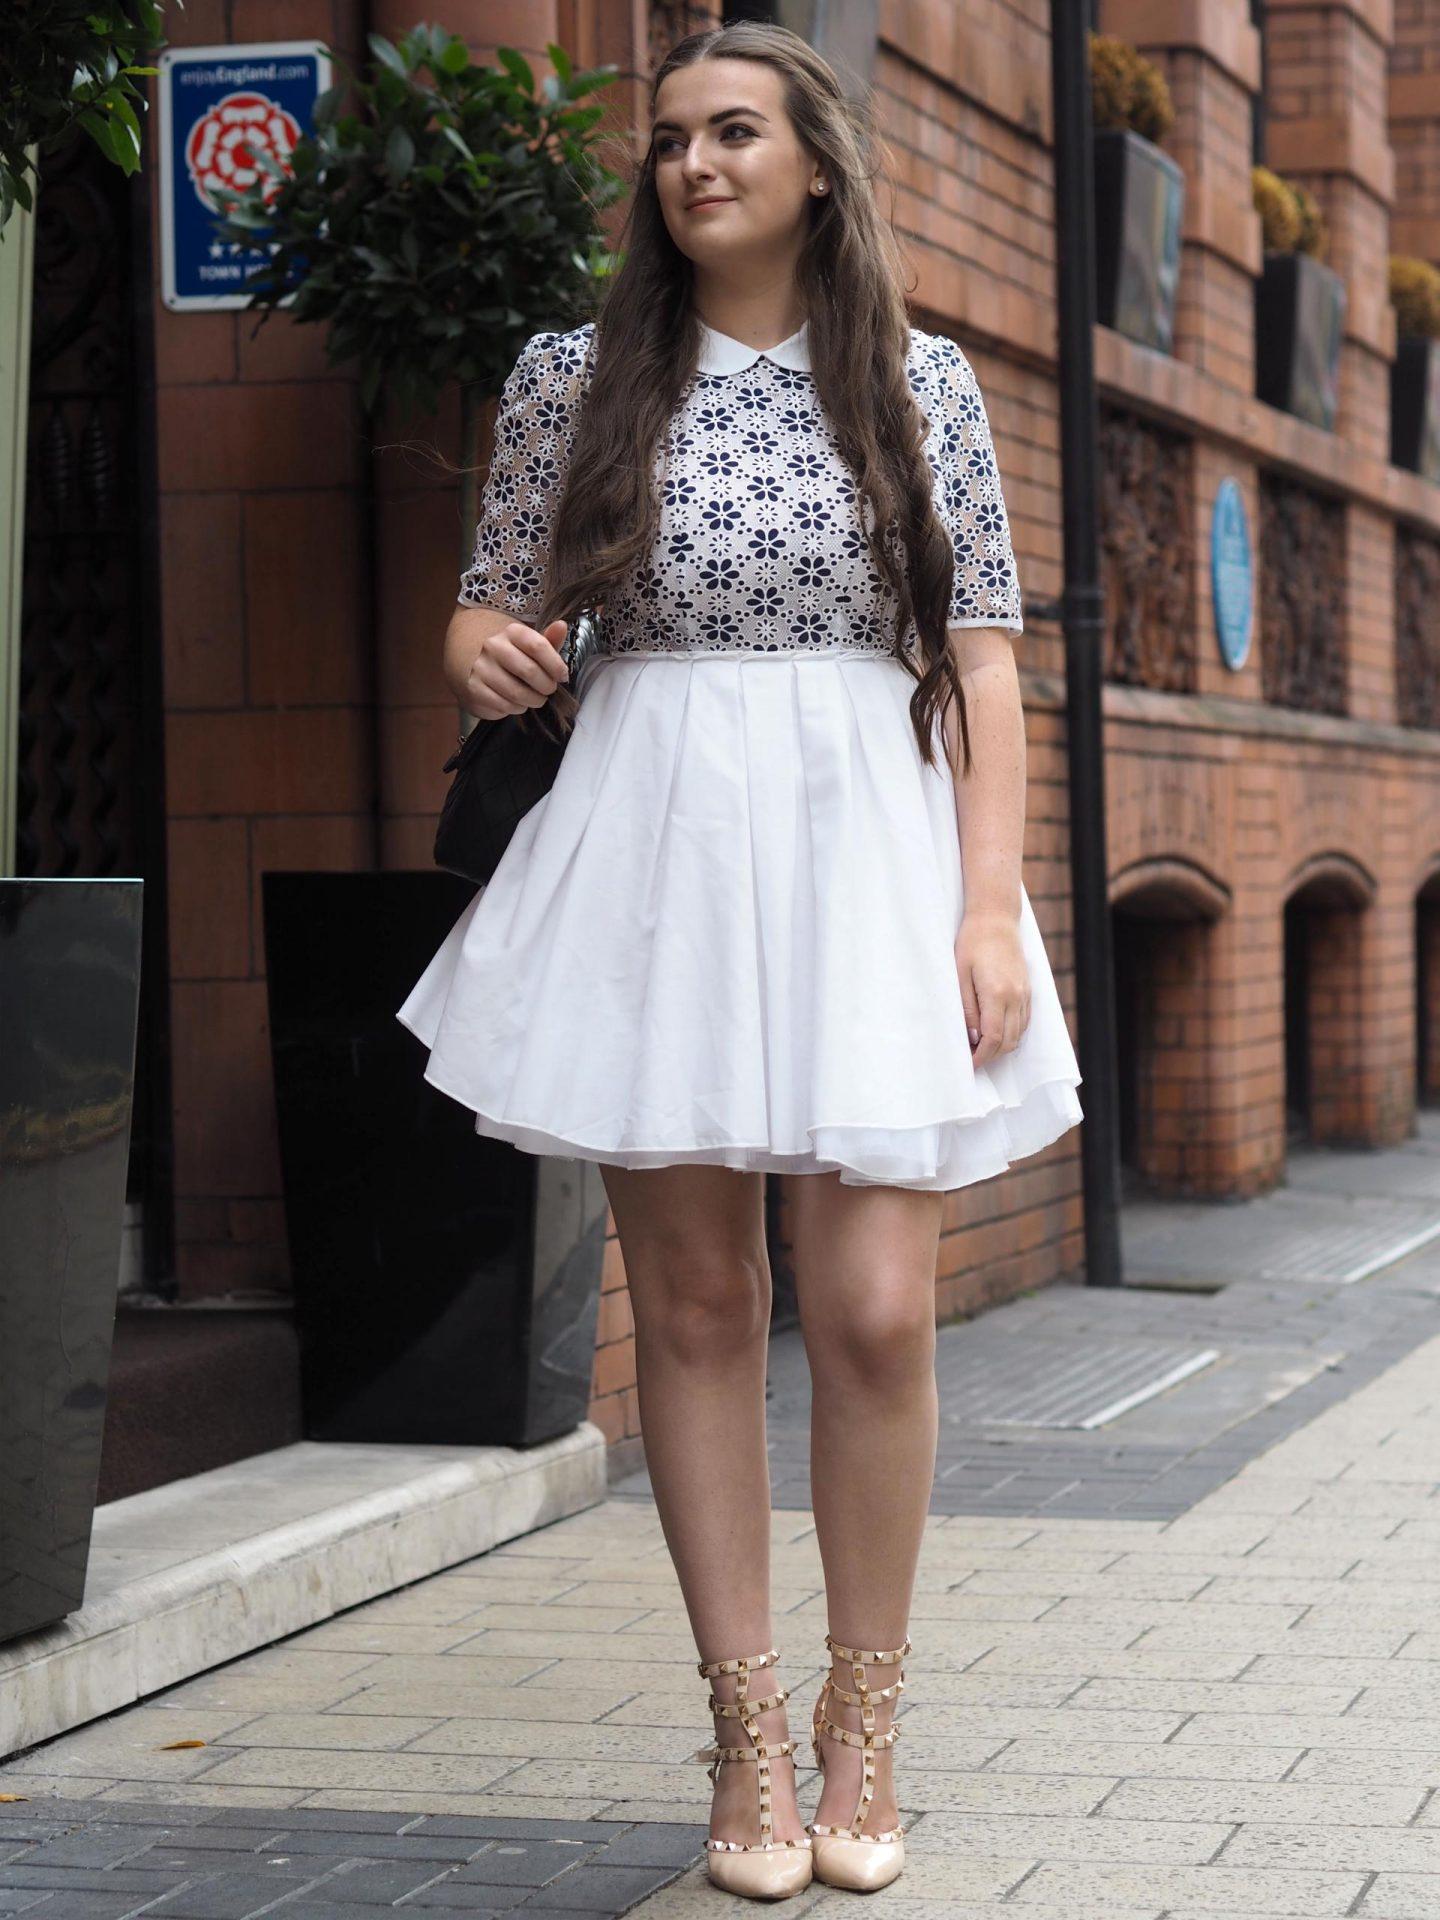 Summer Part Ready, Jones & Jones Audrey Dress - Rachel Nicole UK Style Blogger